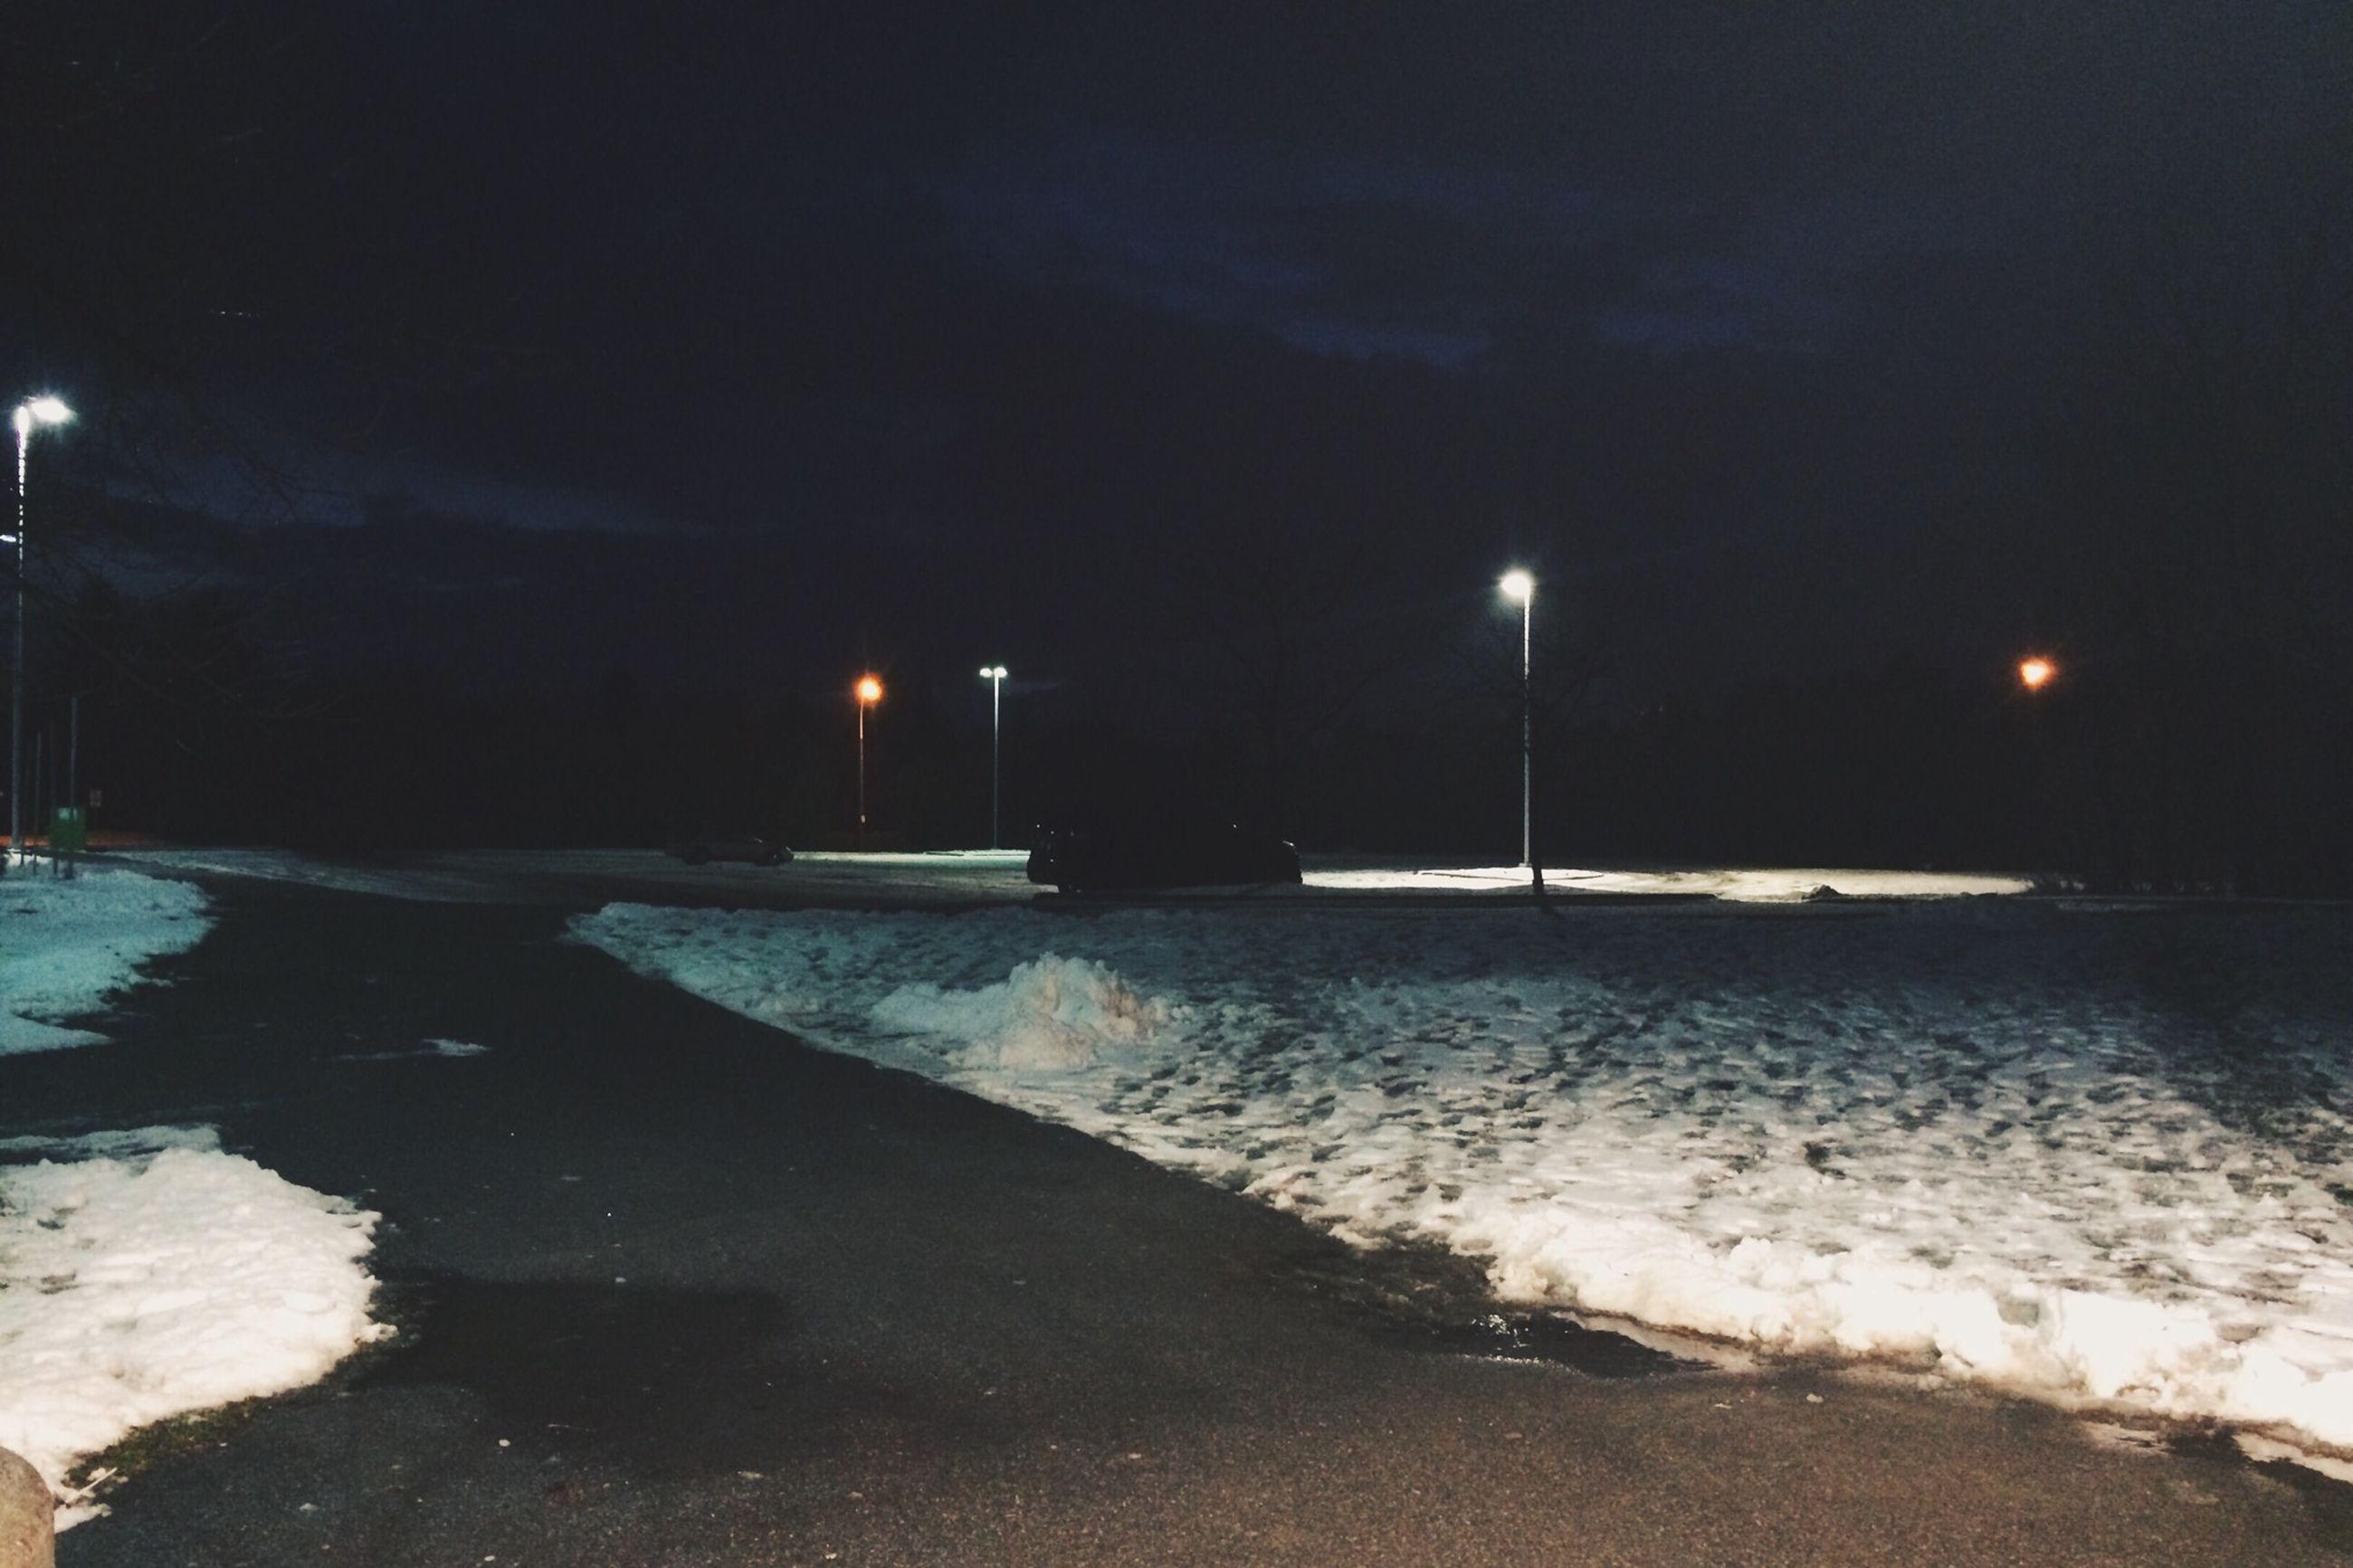 night, street light, snow, illuminated, winter, cold temperature, weather, street, lighting equipment, road, season, sky, transportation, dusk, nature, the way forward, outdoors, tranquility, frozen, silhouette